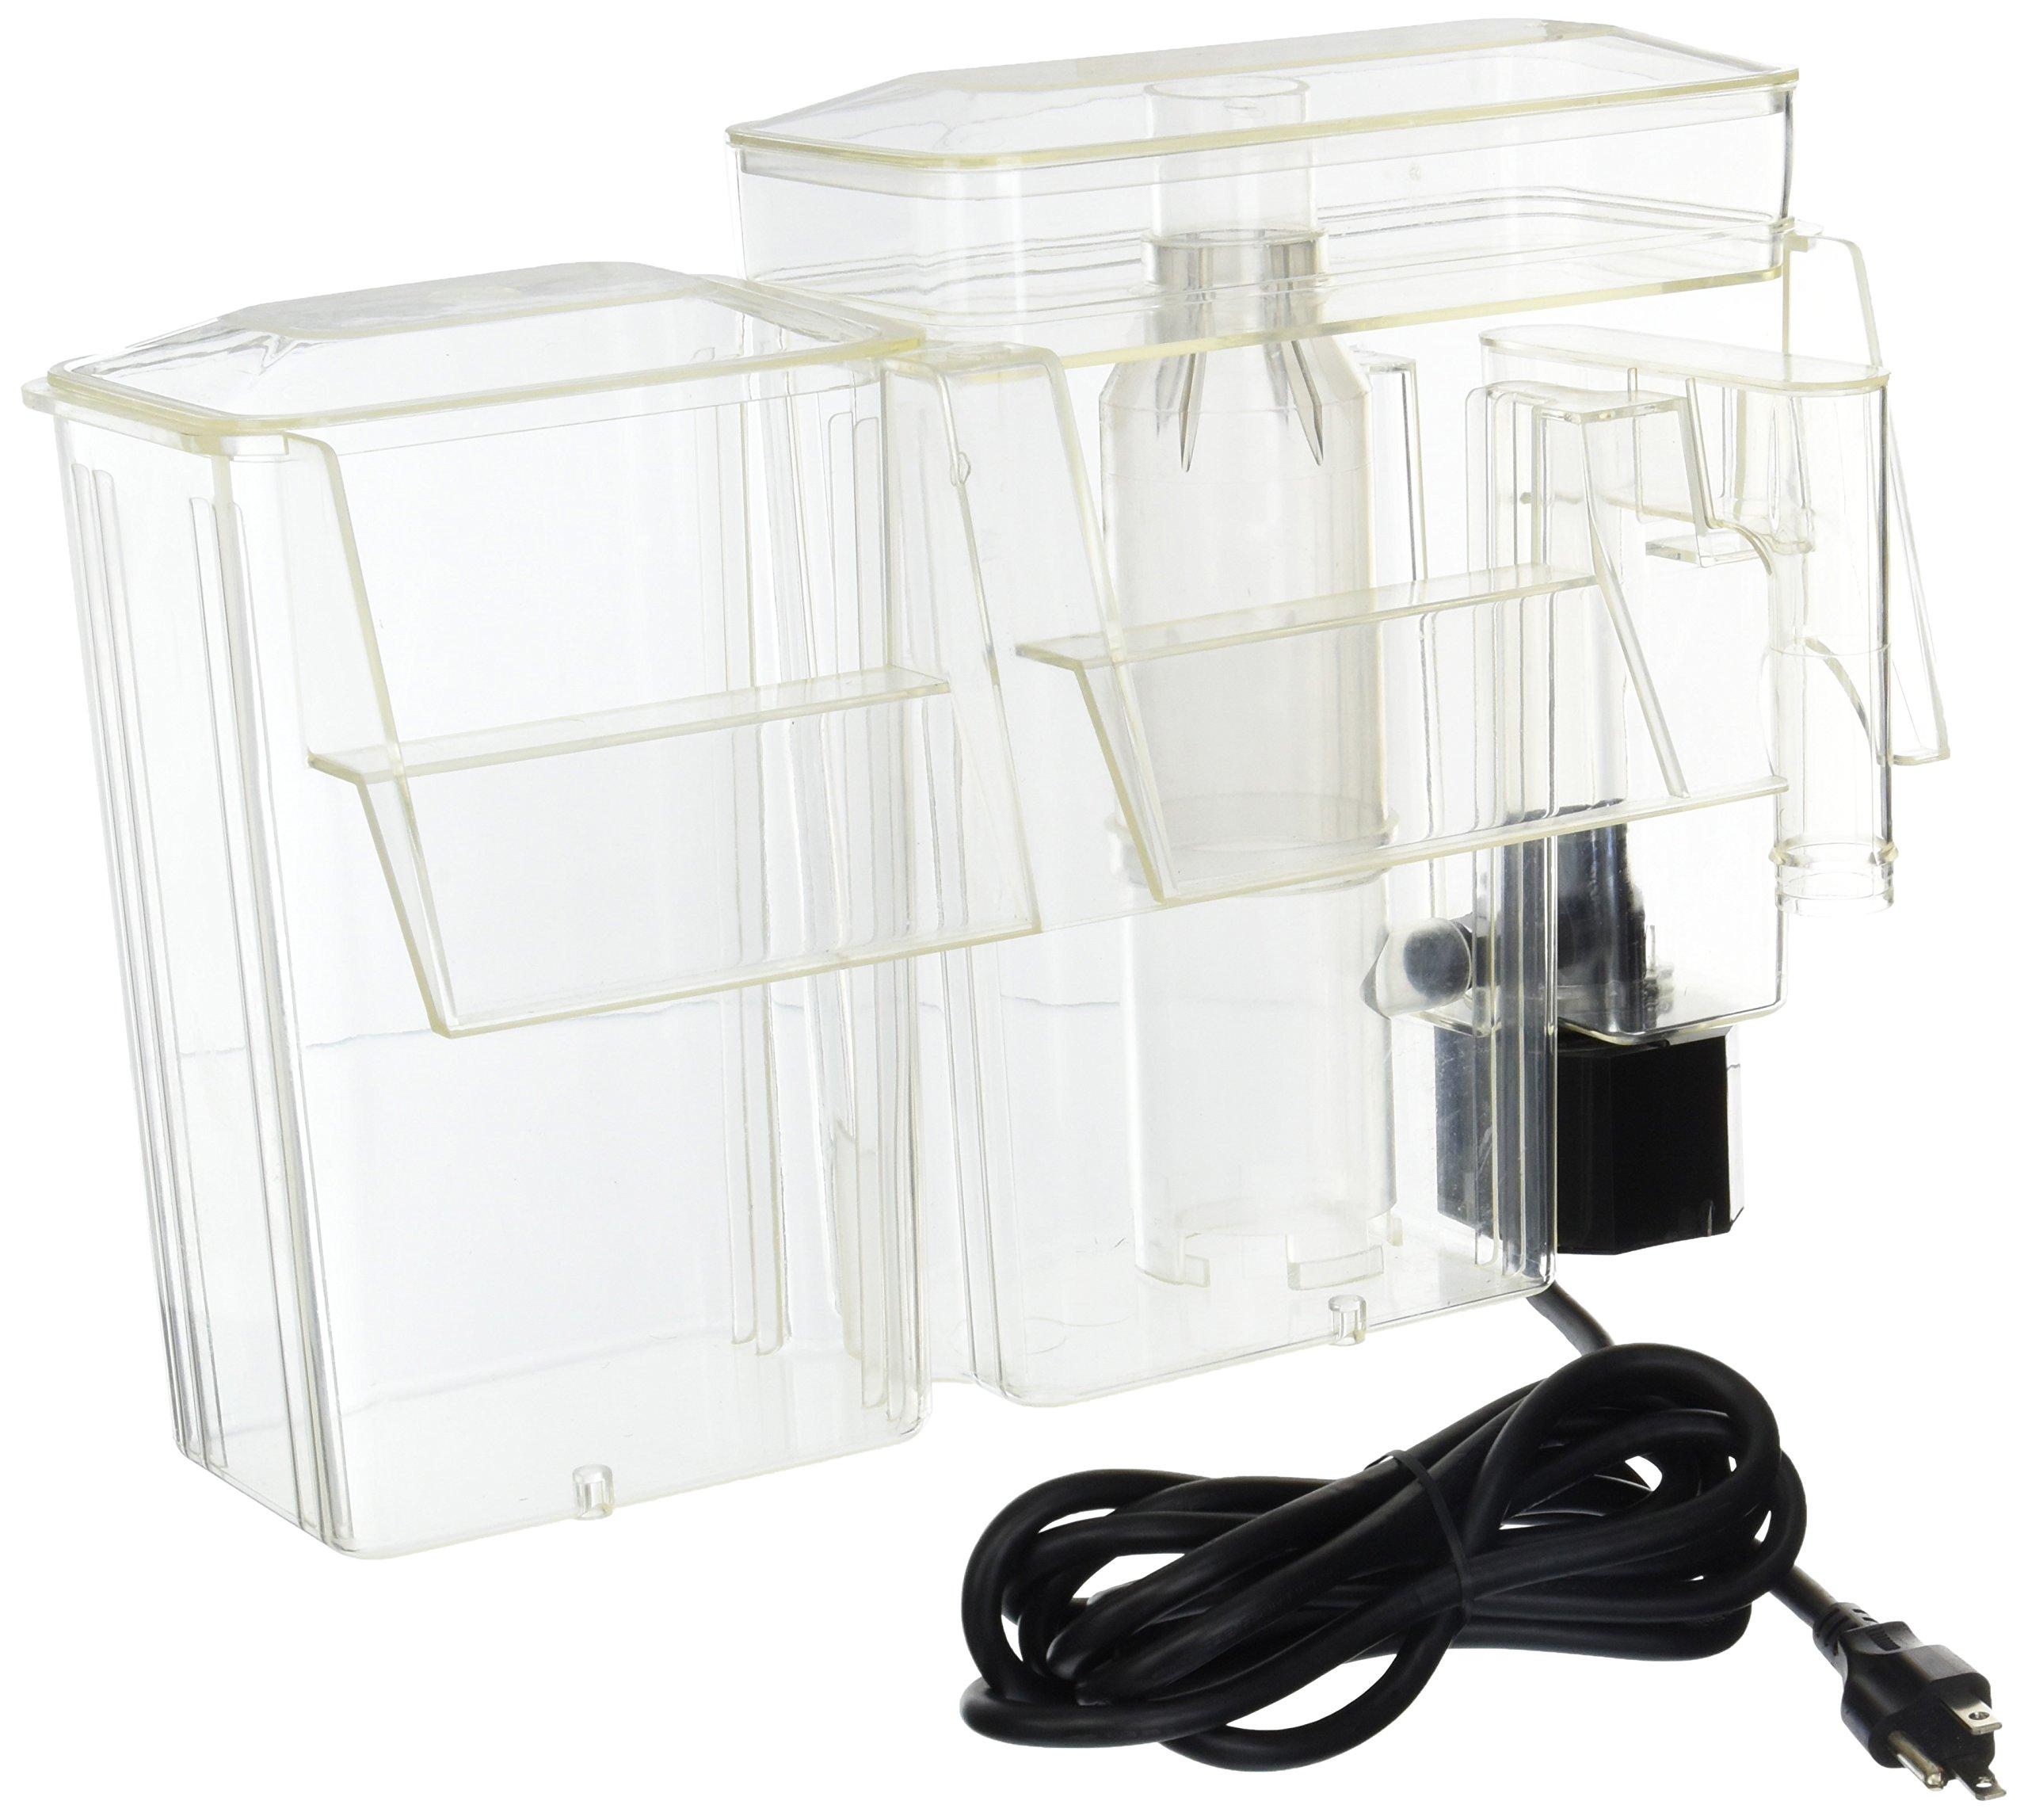 Supreme (Danner) ASP01033 Skilter 400 Power Filter for Aquarium